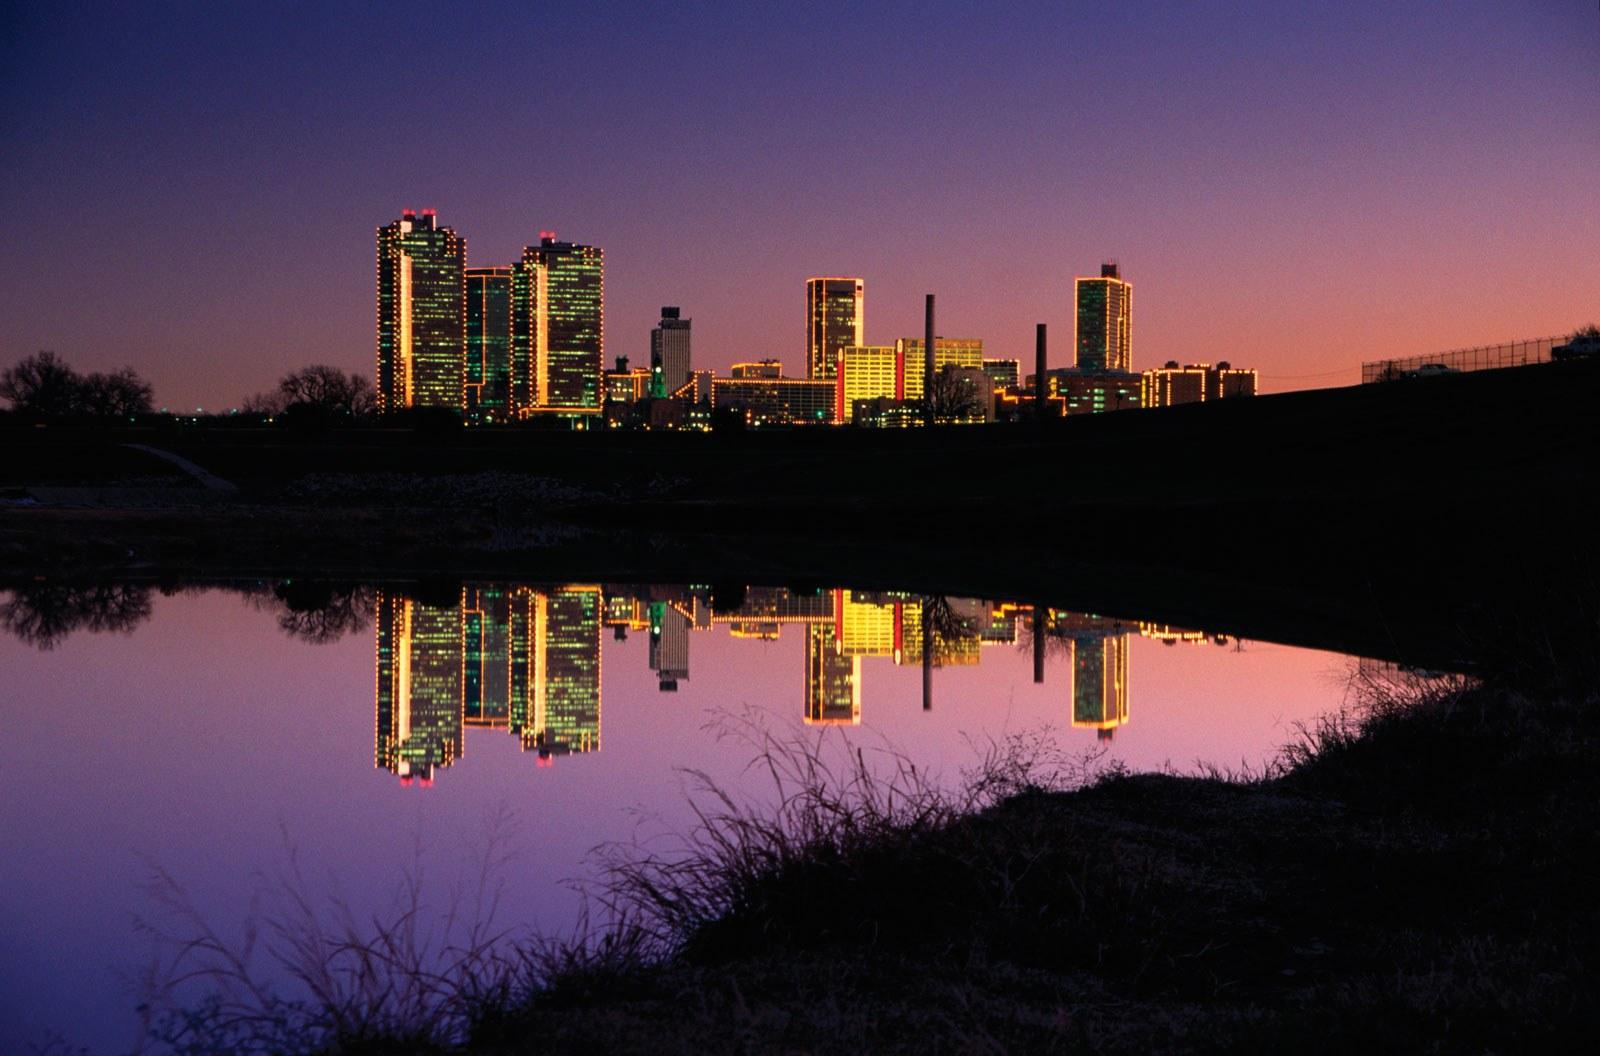 City - Fort Worth, TX